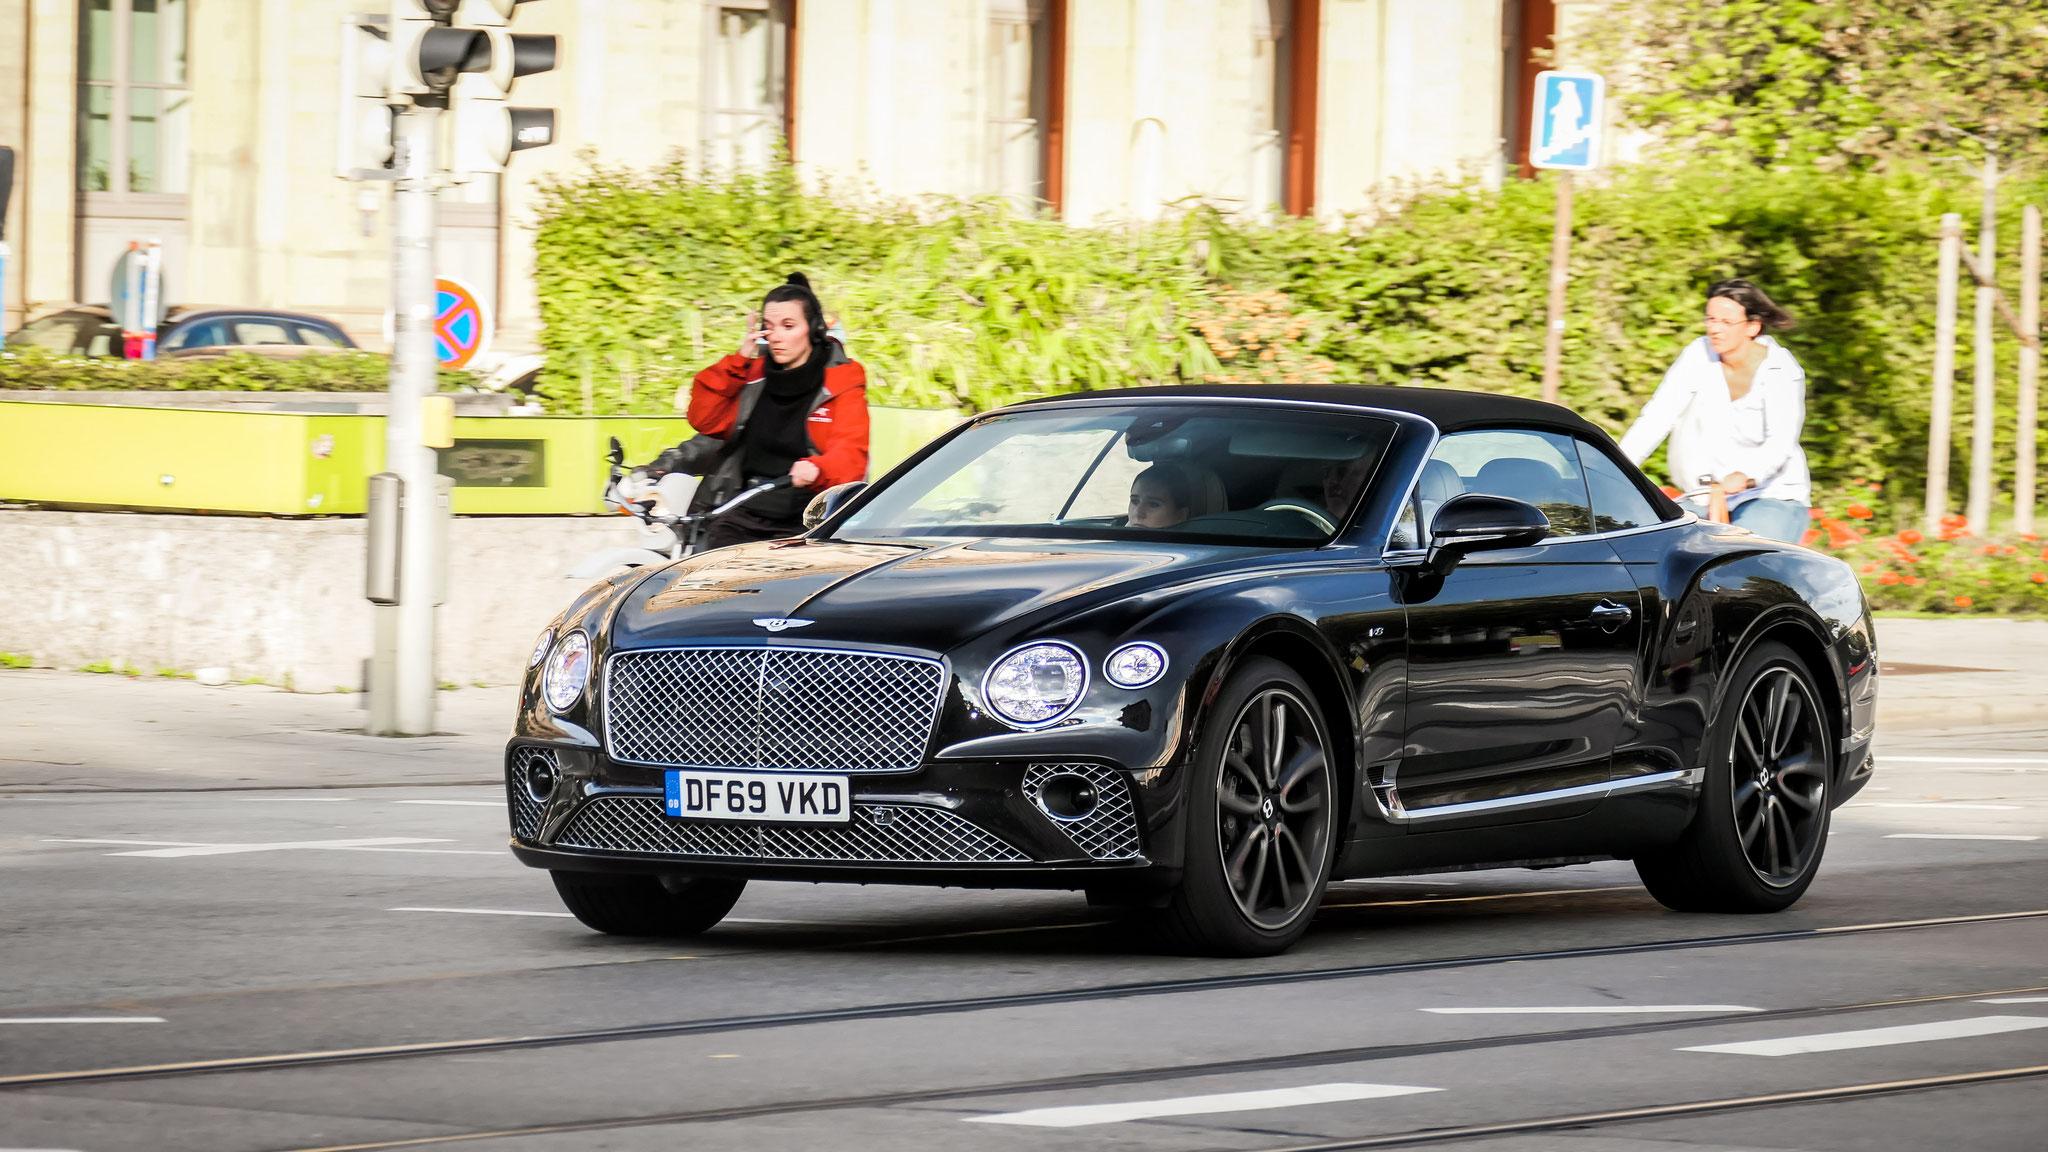 Bentley Continental GTC - DF69-VKD (GB)